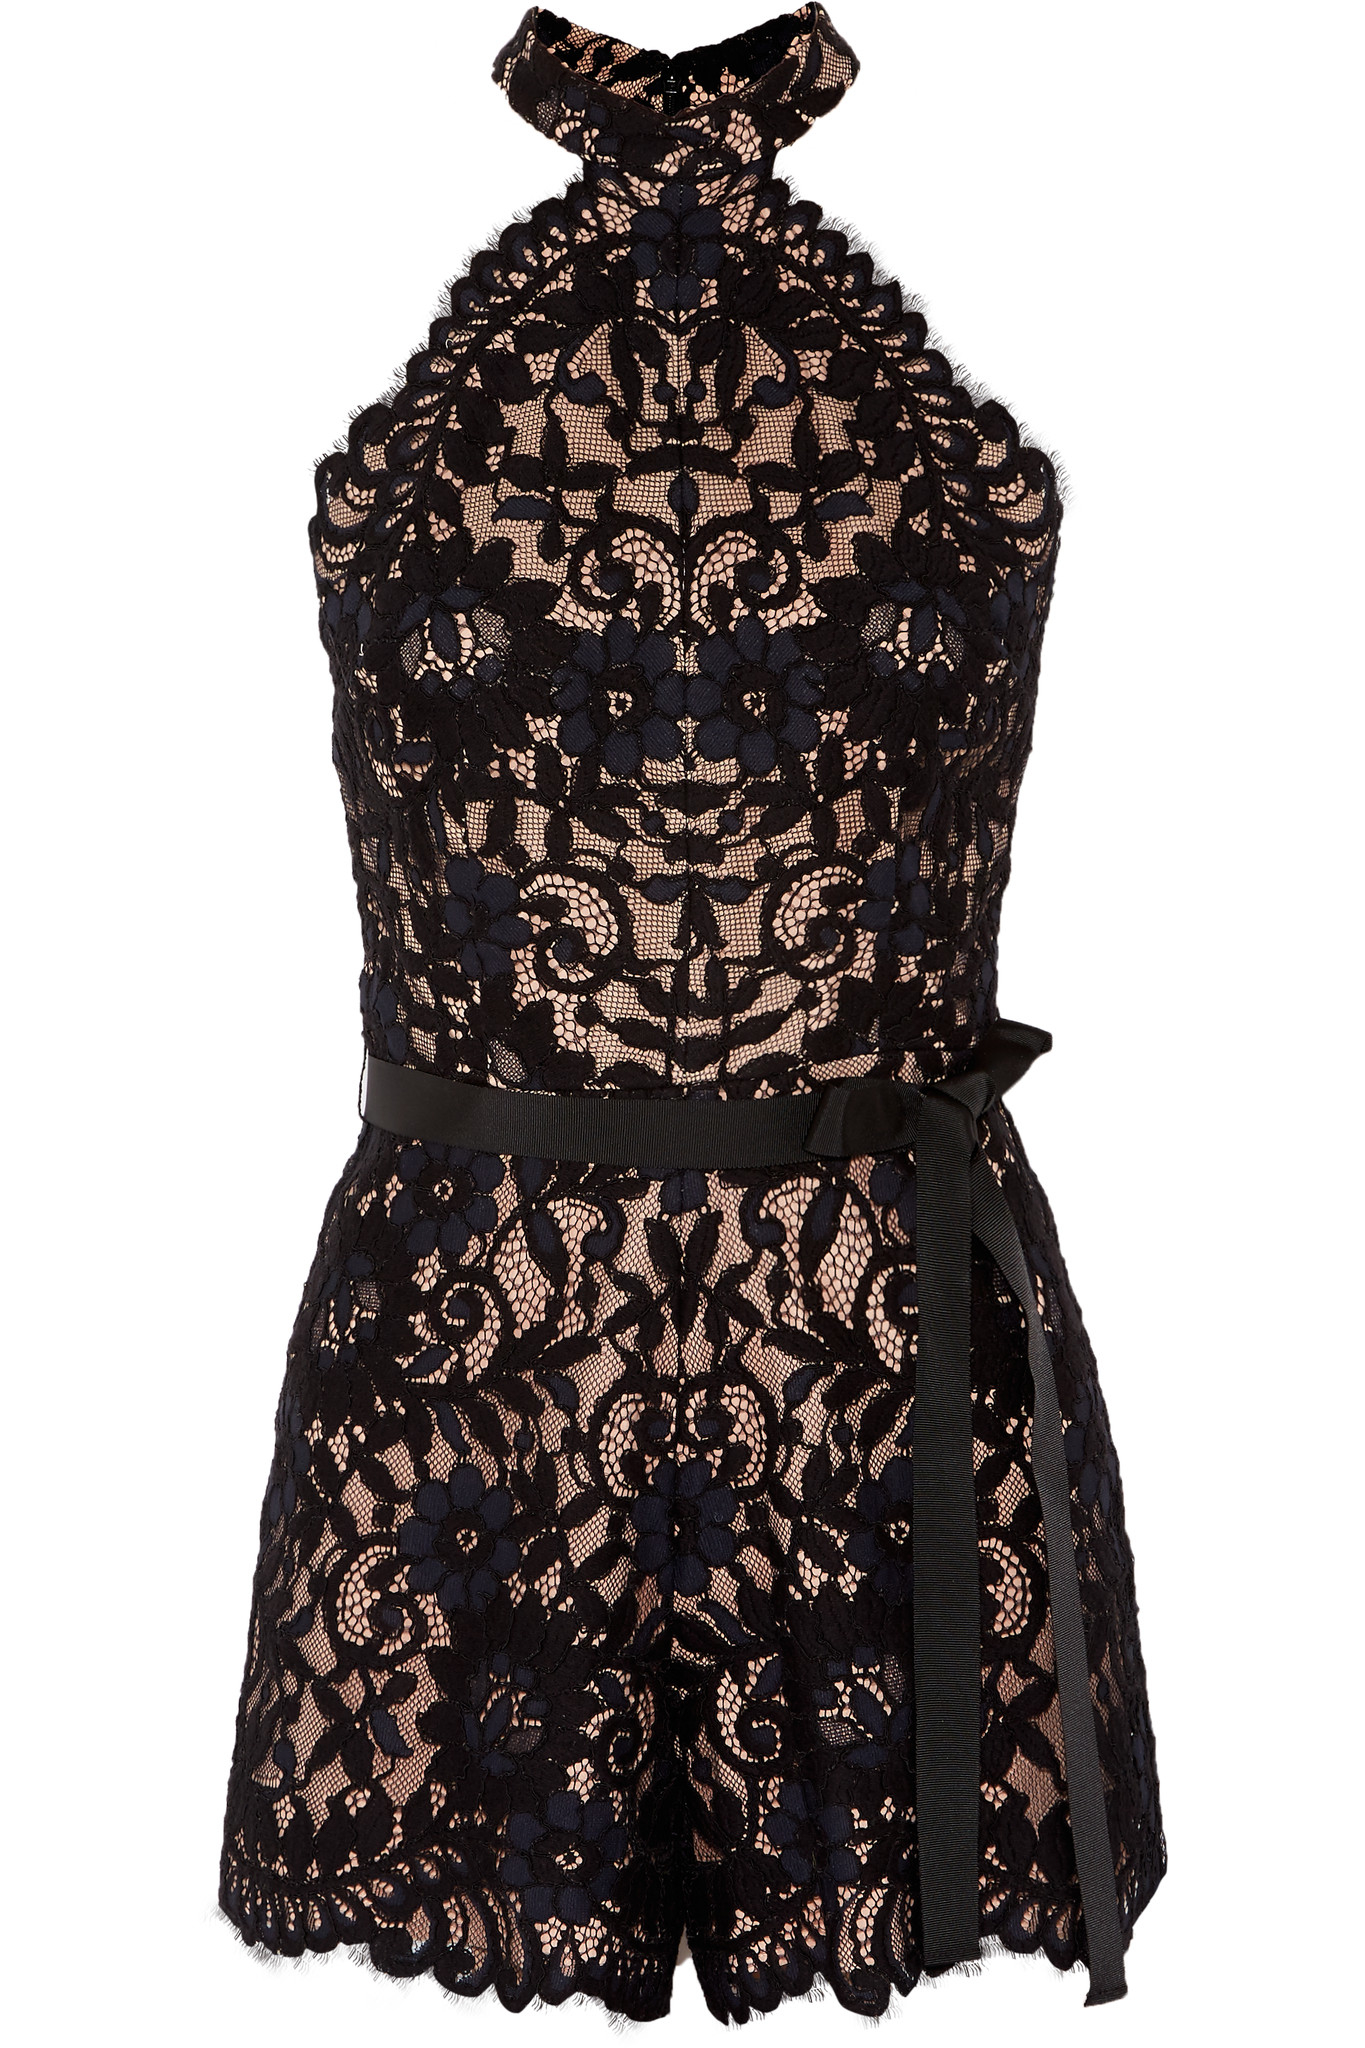 31b012440909 Lyst - Alexis Margot Cotton-blend Lace Playsuit in Black